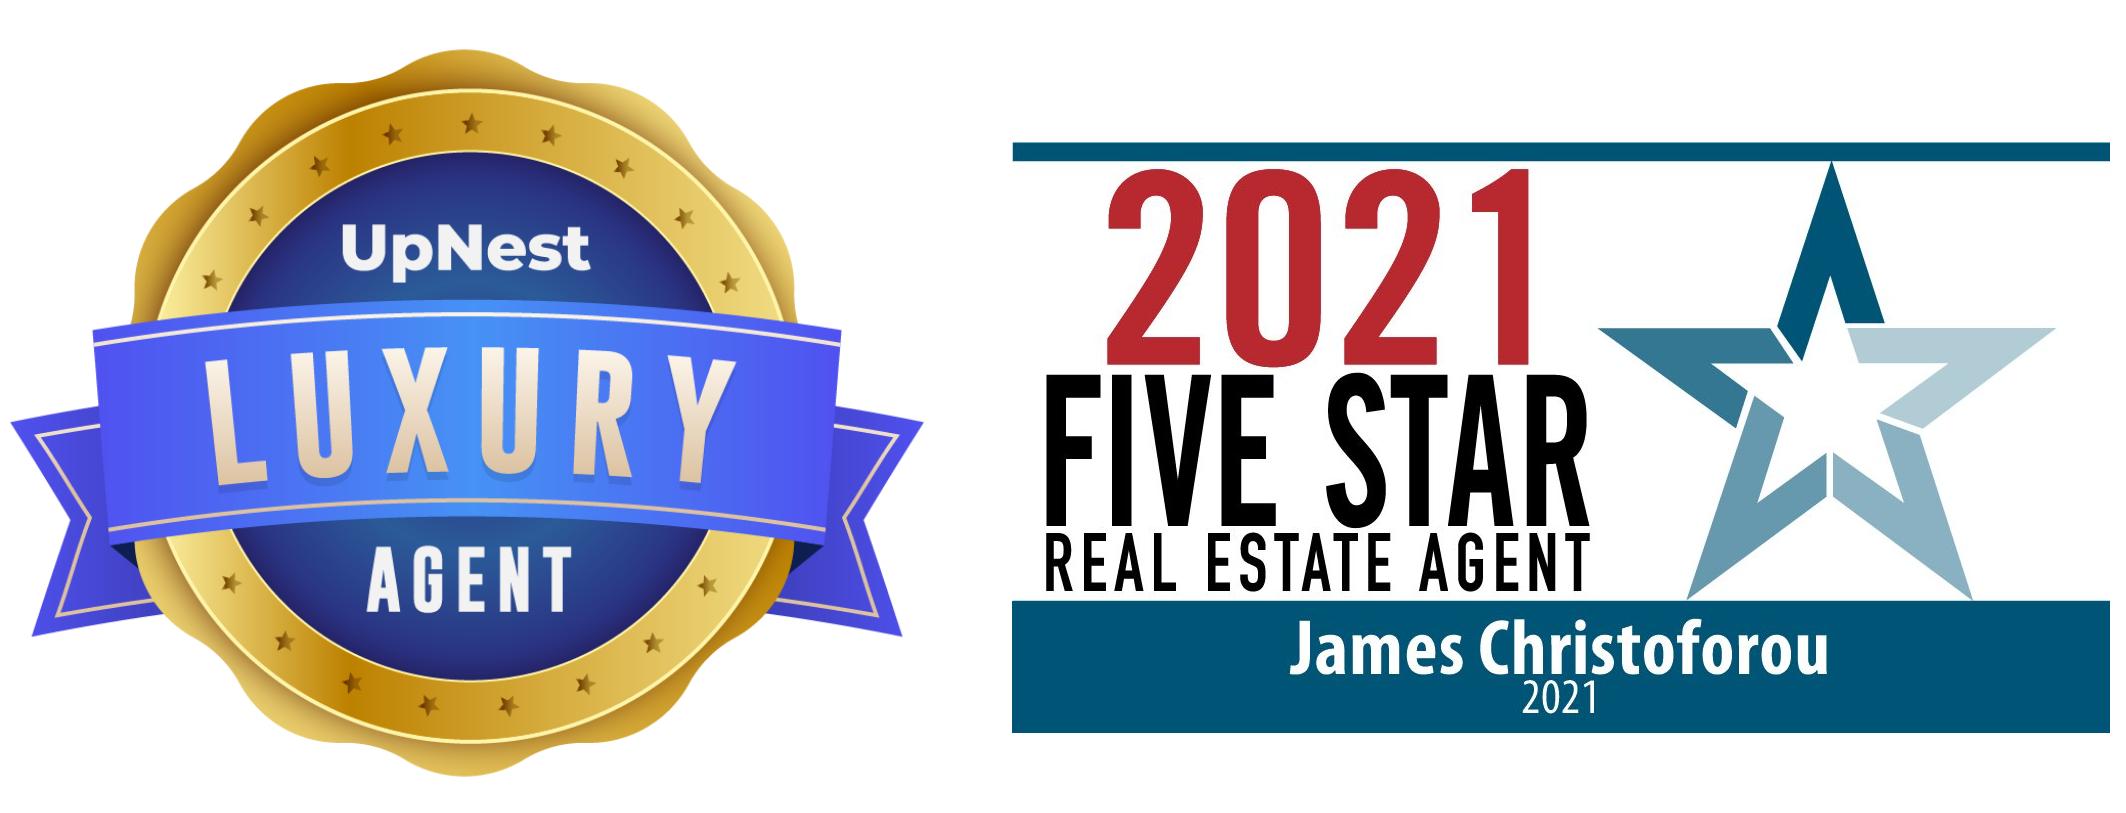 Five Star Real Estate Agent Award 2021